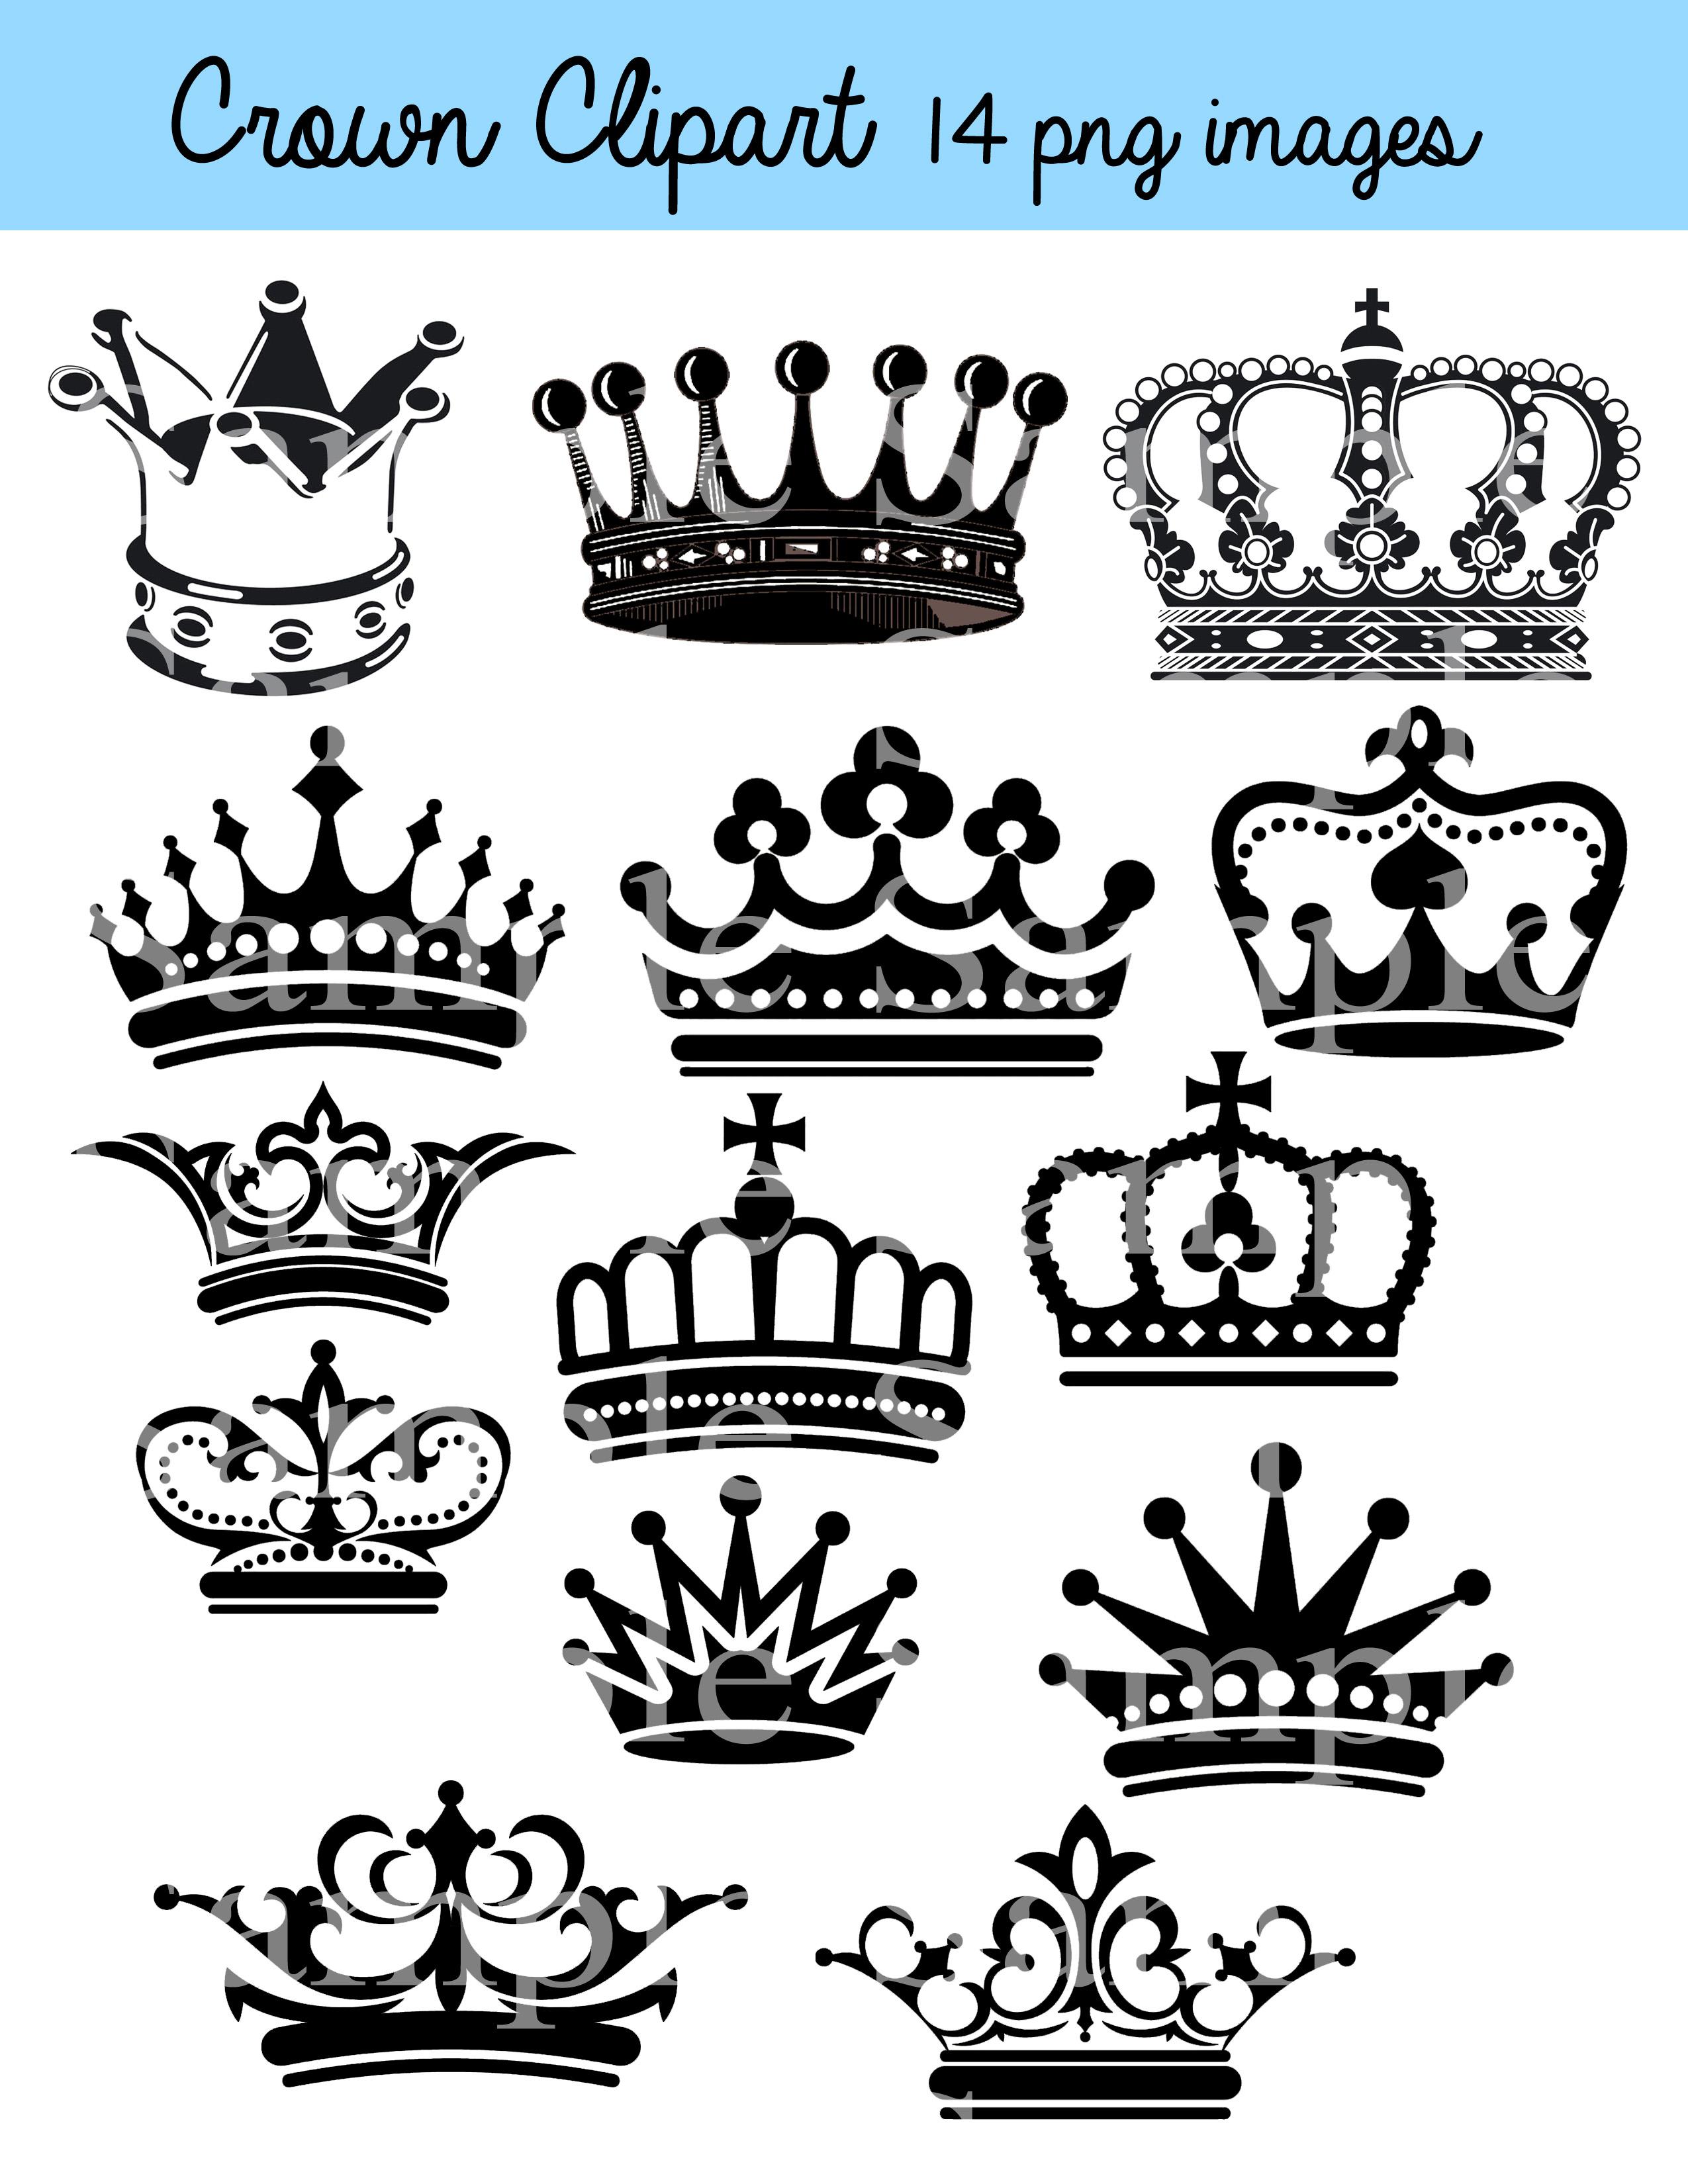 Crown Clipart Clip Art, Crown Silhouette Clipart Clip Art Black Crowns,  Color Crowns, Royal Clipart Princess Crowns.